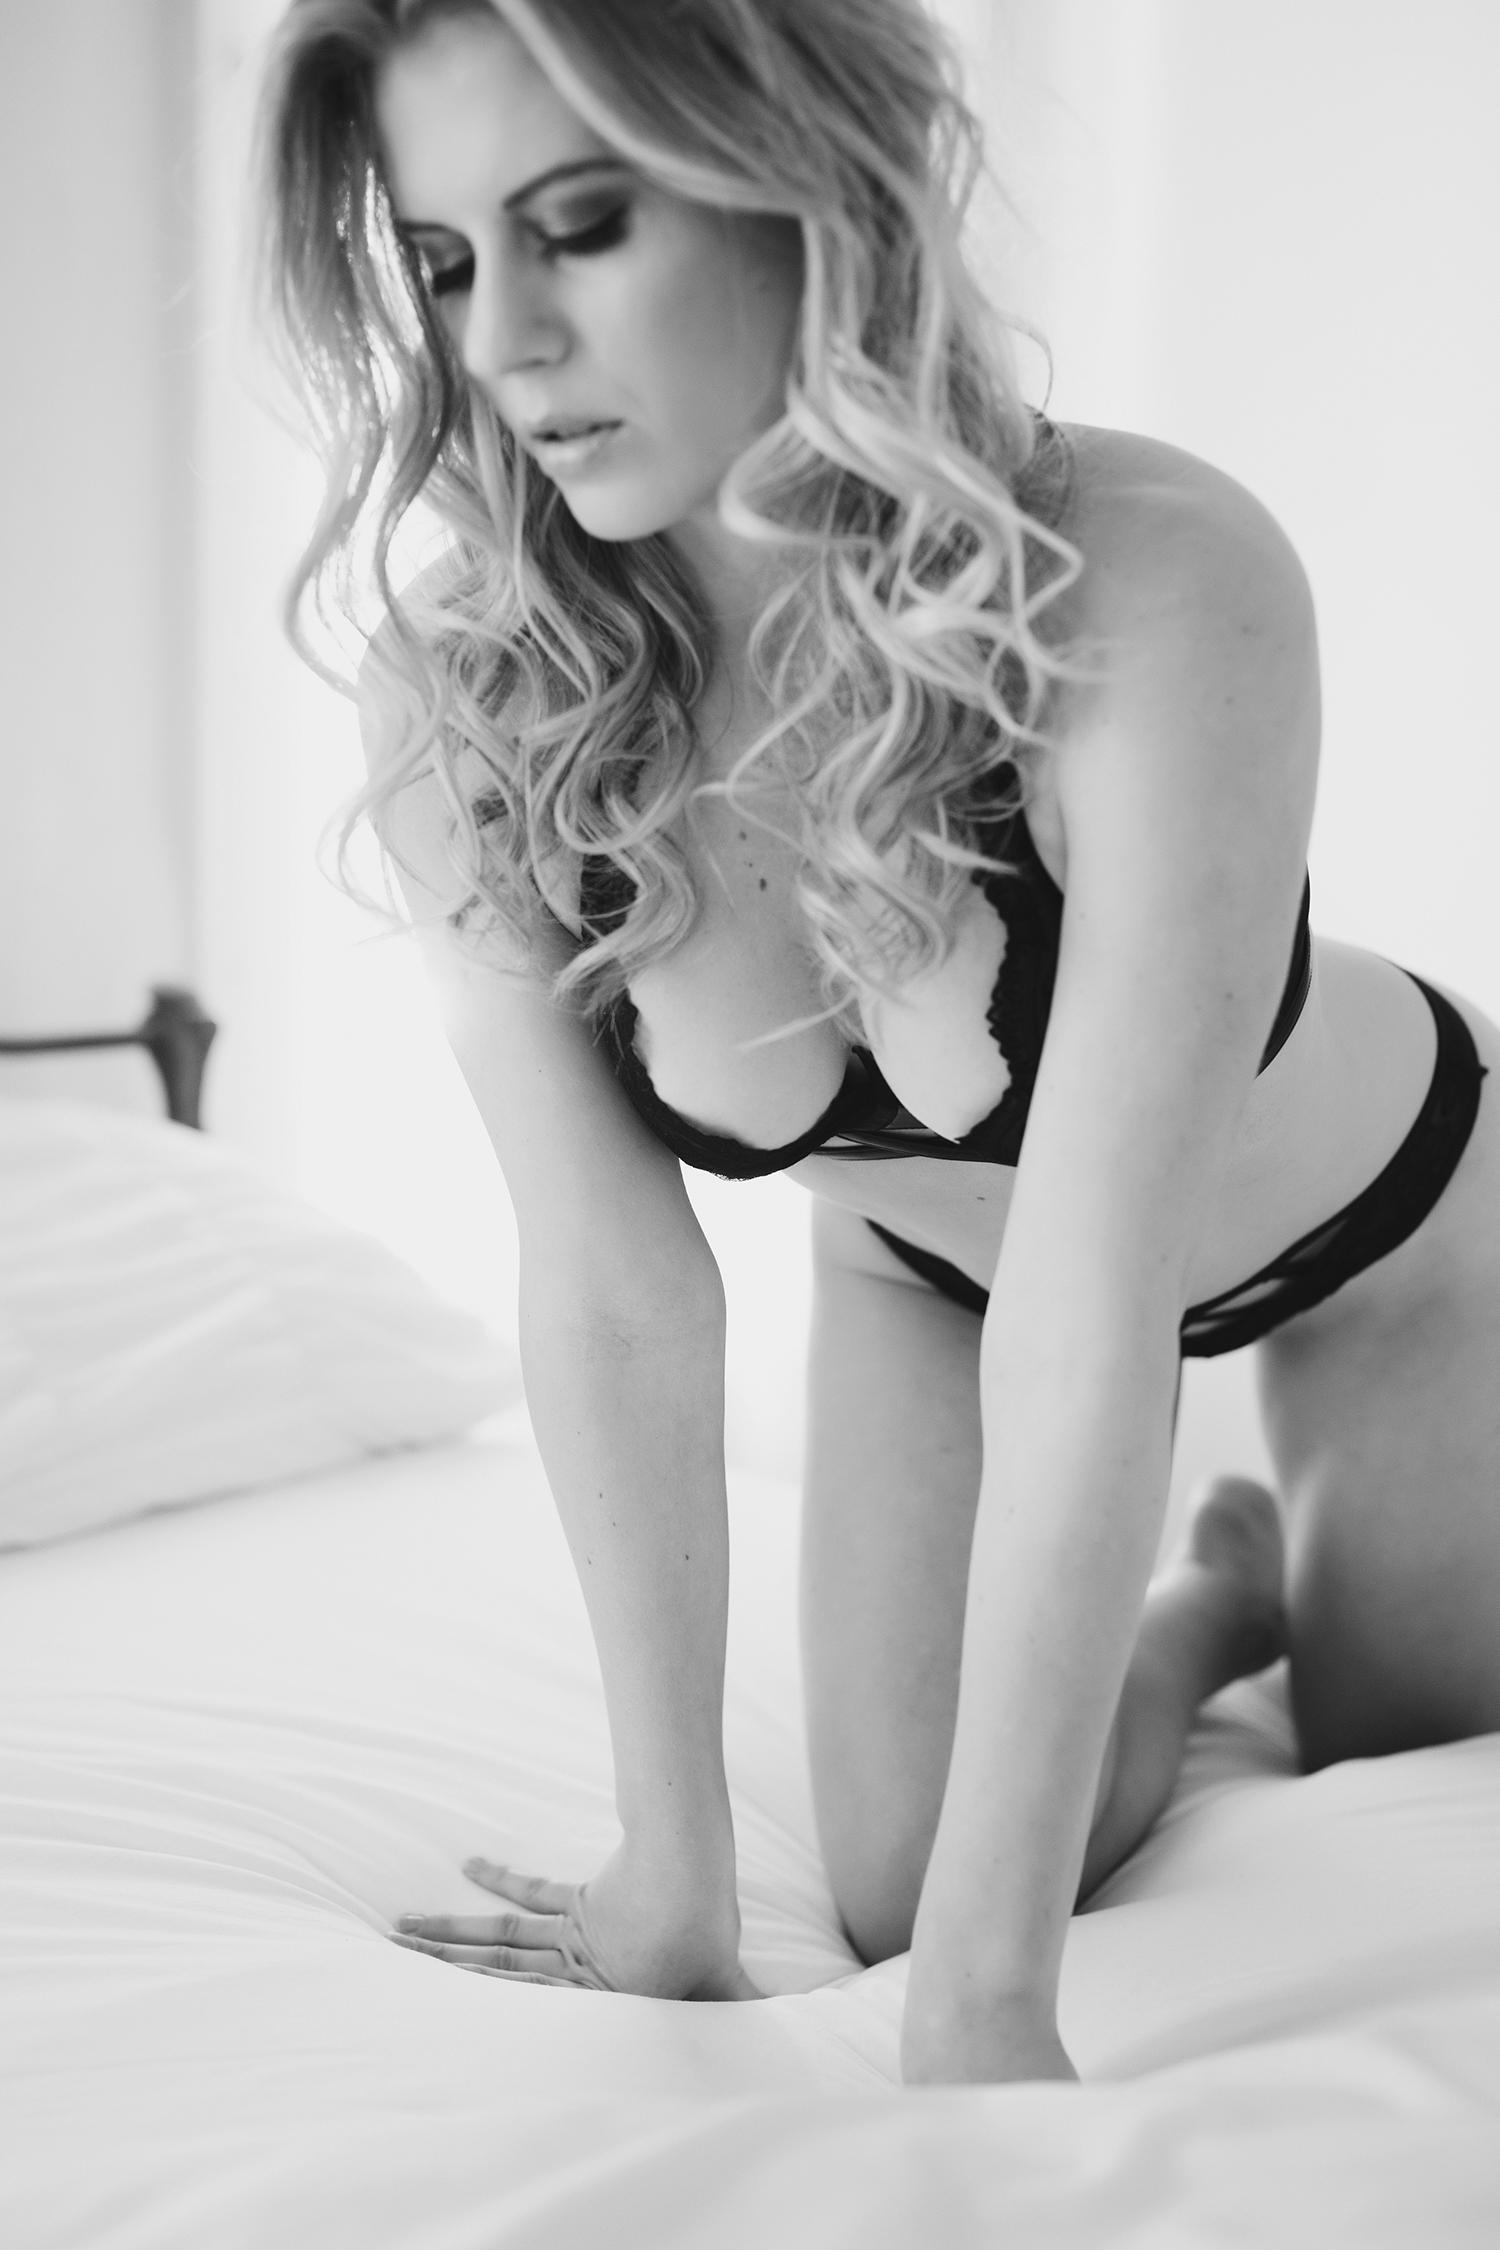 austin-bridal-boudoir-kimberly-brooke-17.jpg